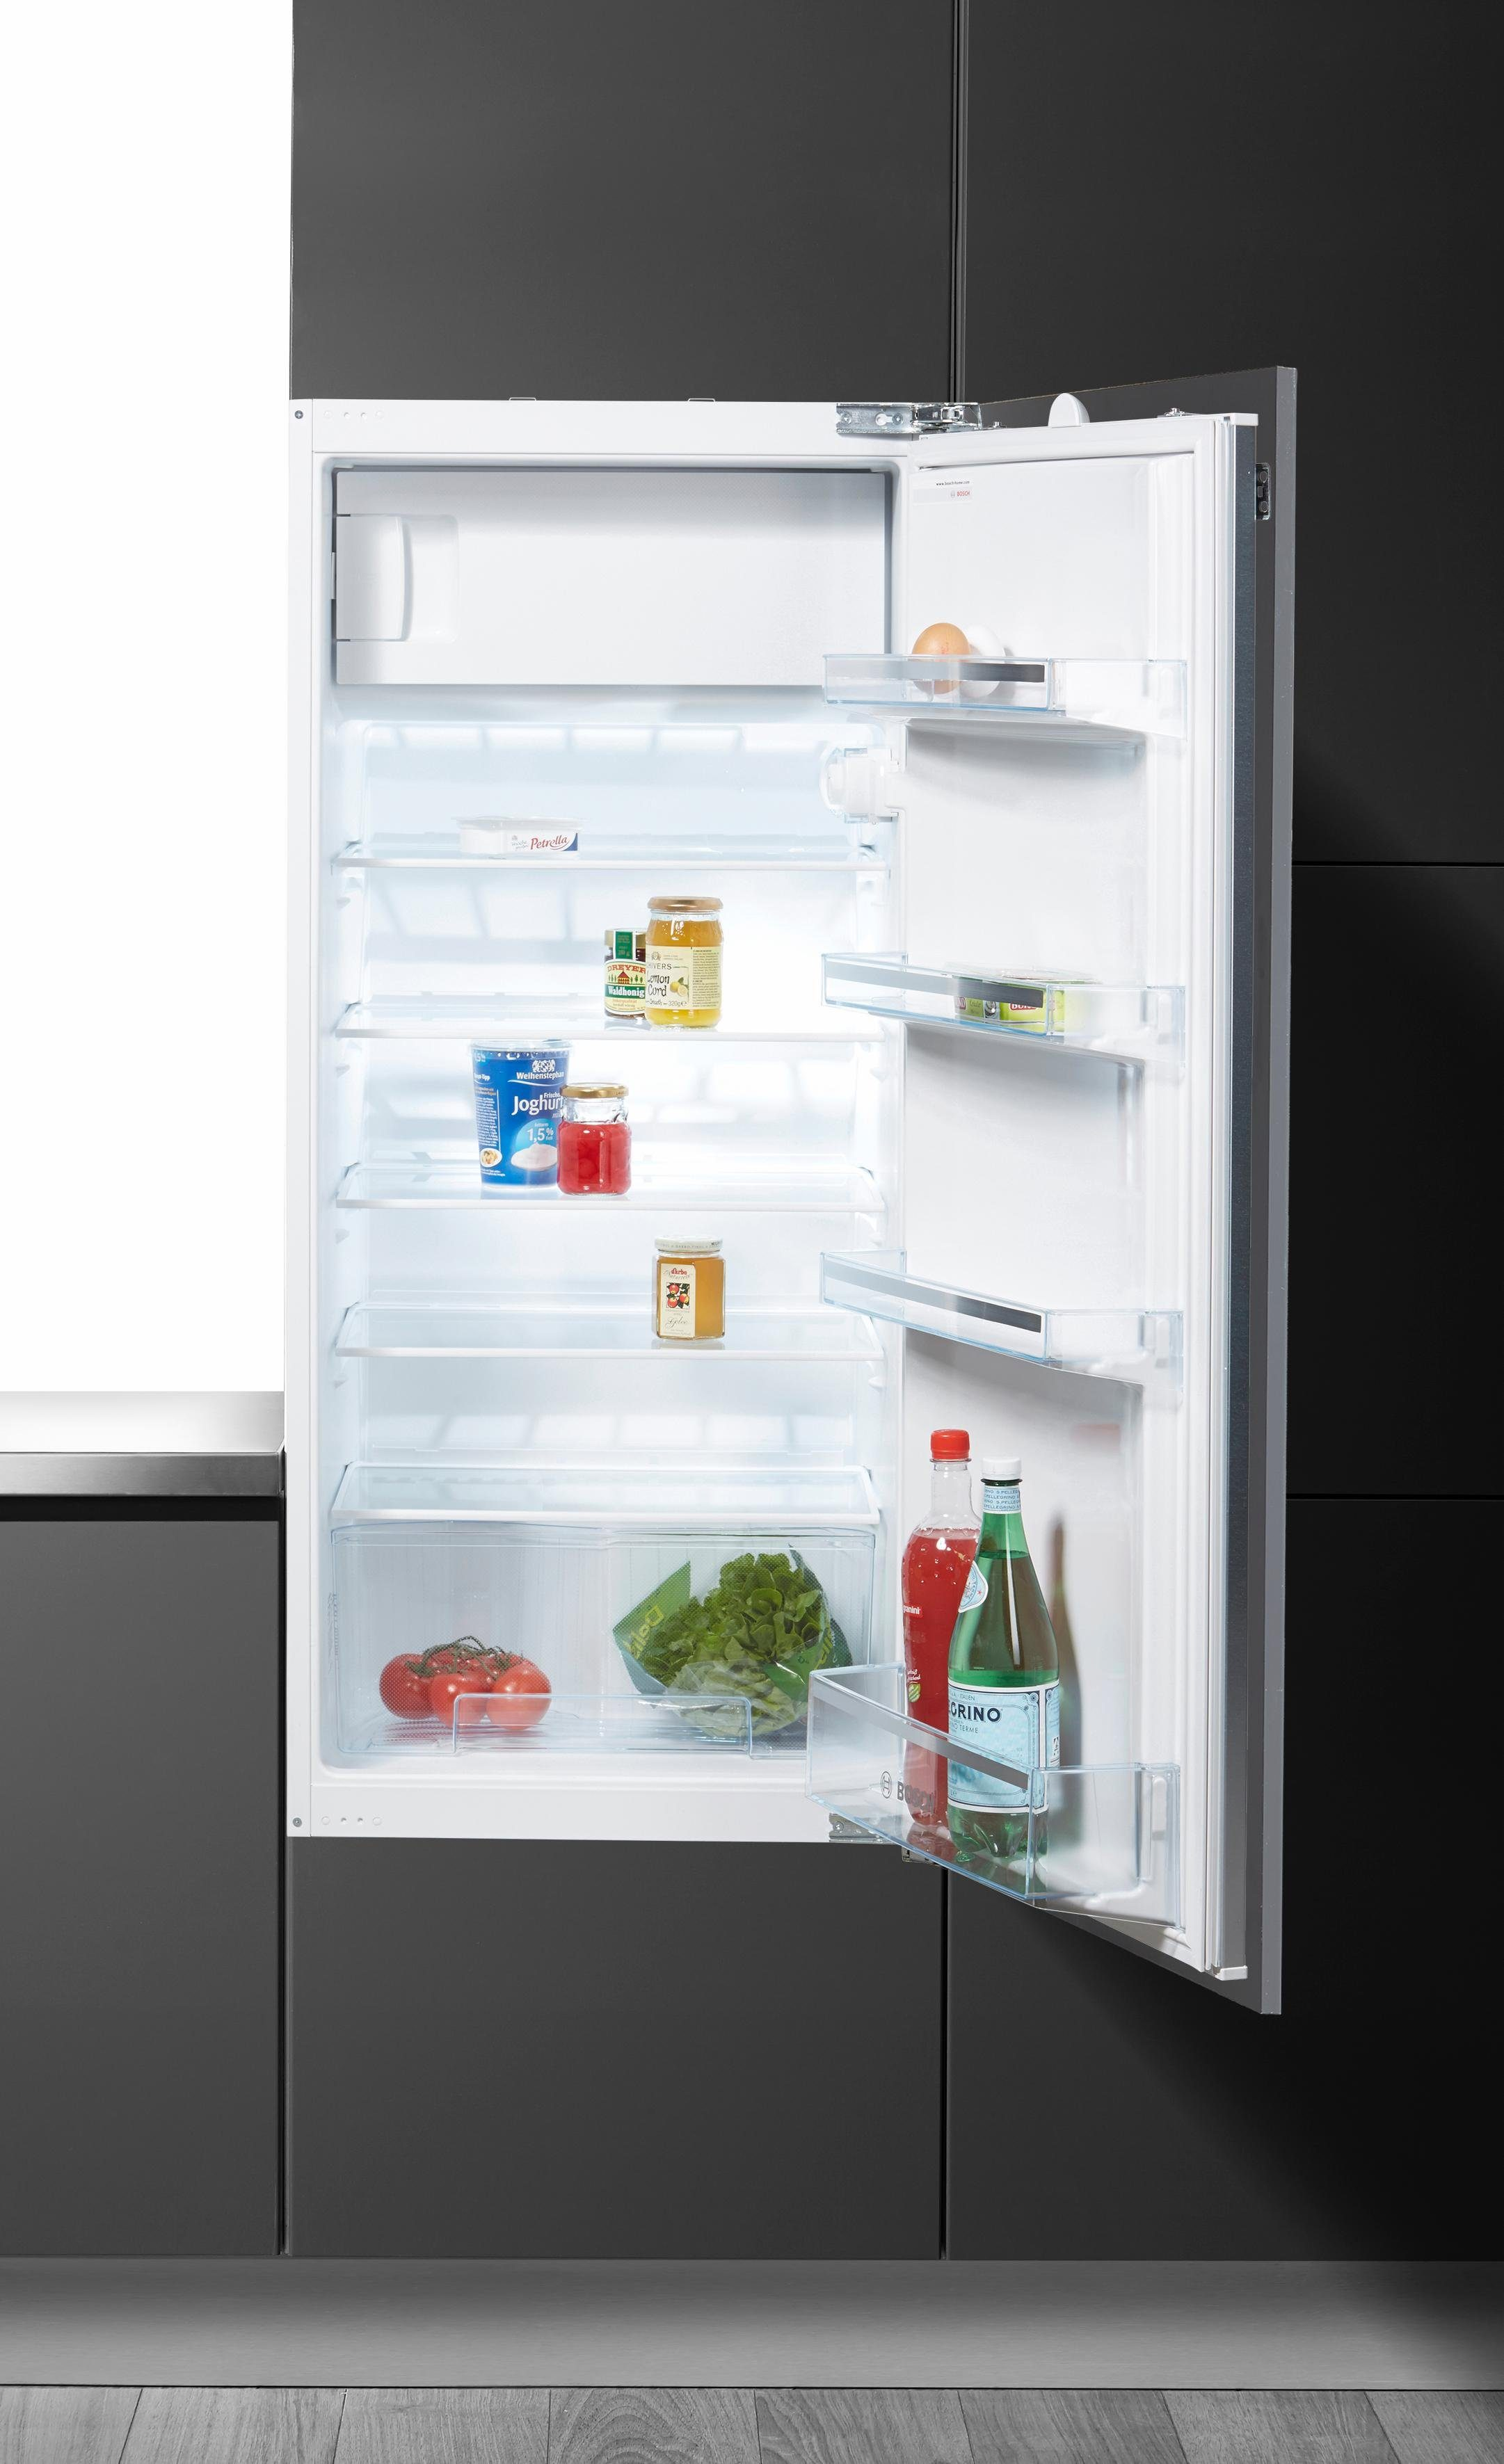 Bosch integrierbarer Einbau-Kühlschrank KIL24V60, A++, 122,5 cm